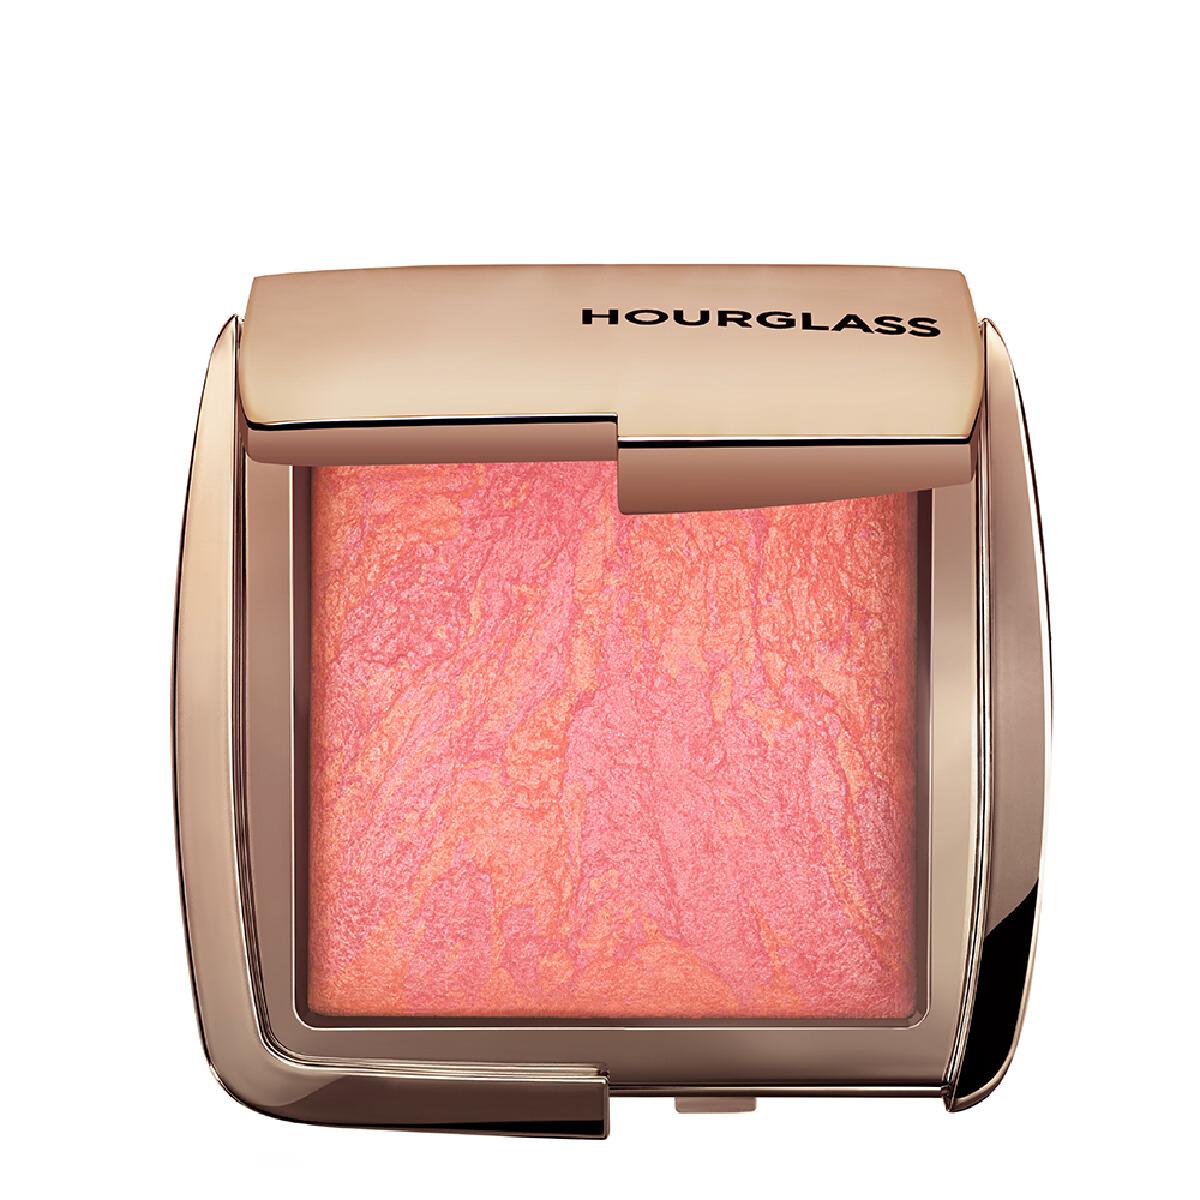 Hourglass Ambient Lighting Blush – Sublime Flush